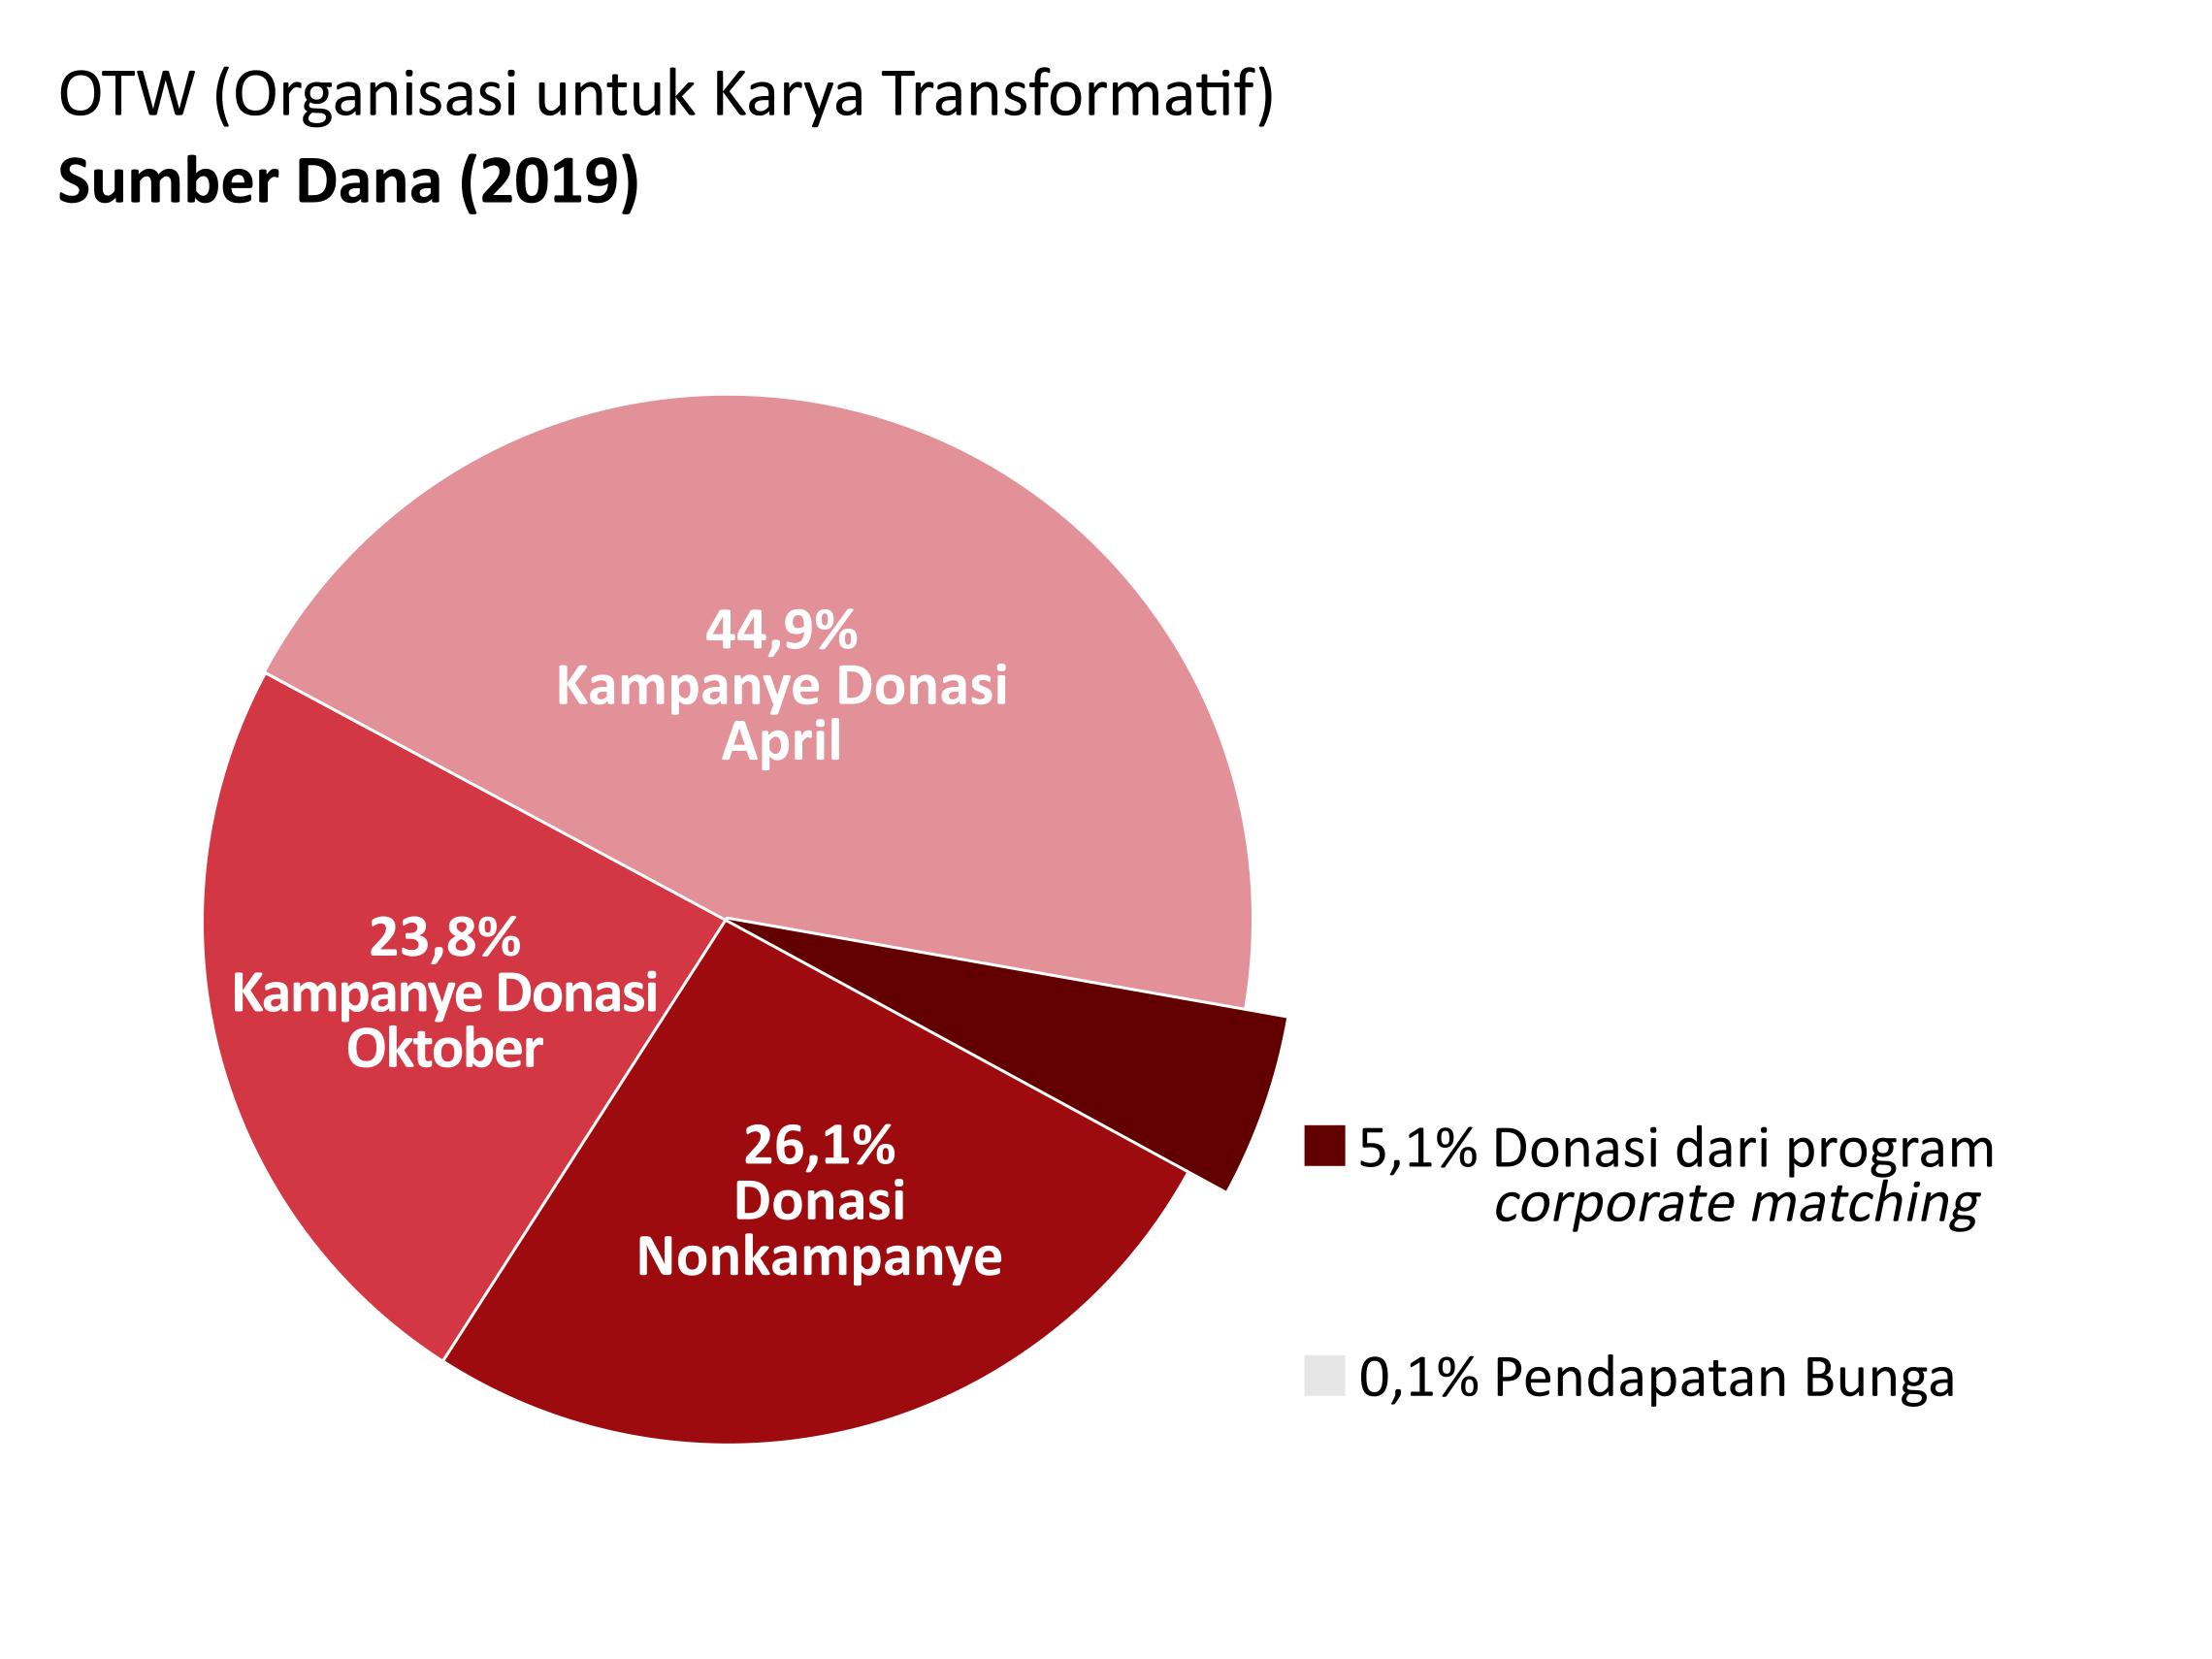 Pendapatan OTW: Kampanye donasi April: 44,9%. Kampanye donasi Oktober: 23,8%. Donasi nonkampanye: 26,1%. Donasi dari program penggandaan (<i>corporate matching</i>): 5,1%. Pendapatan bunga: 0,1%.